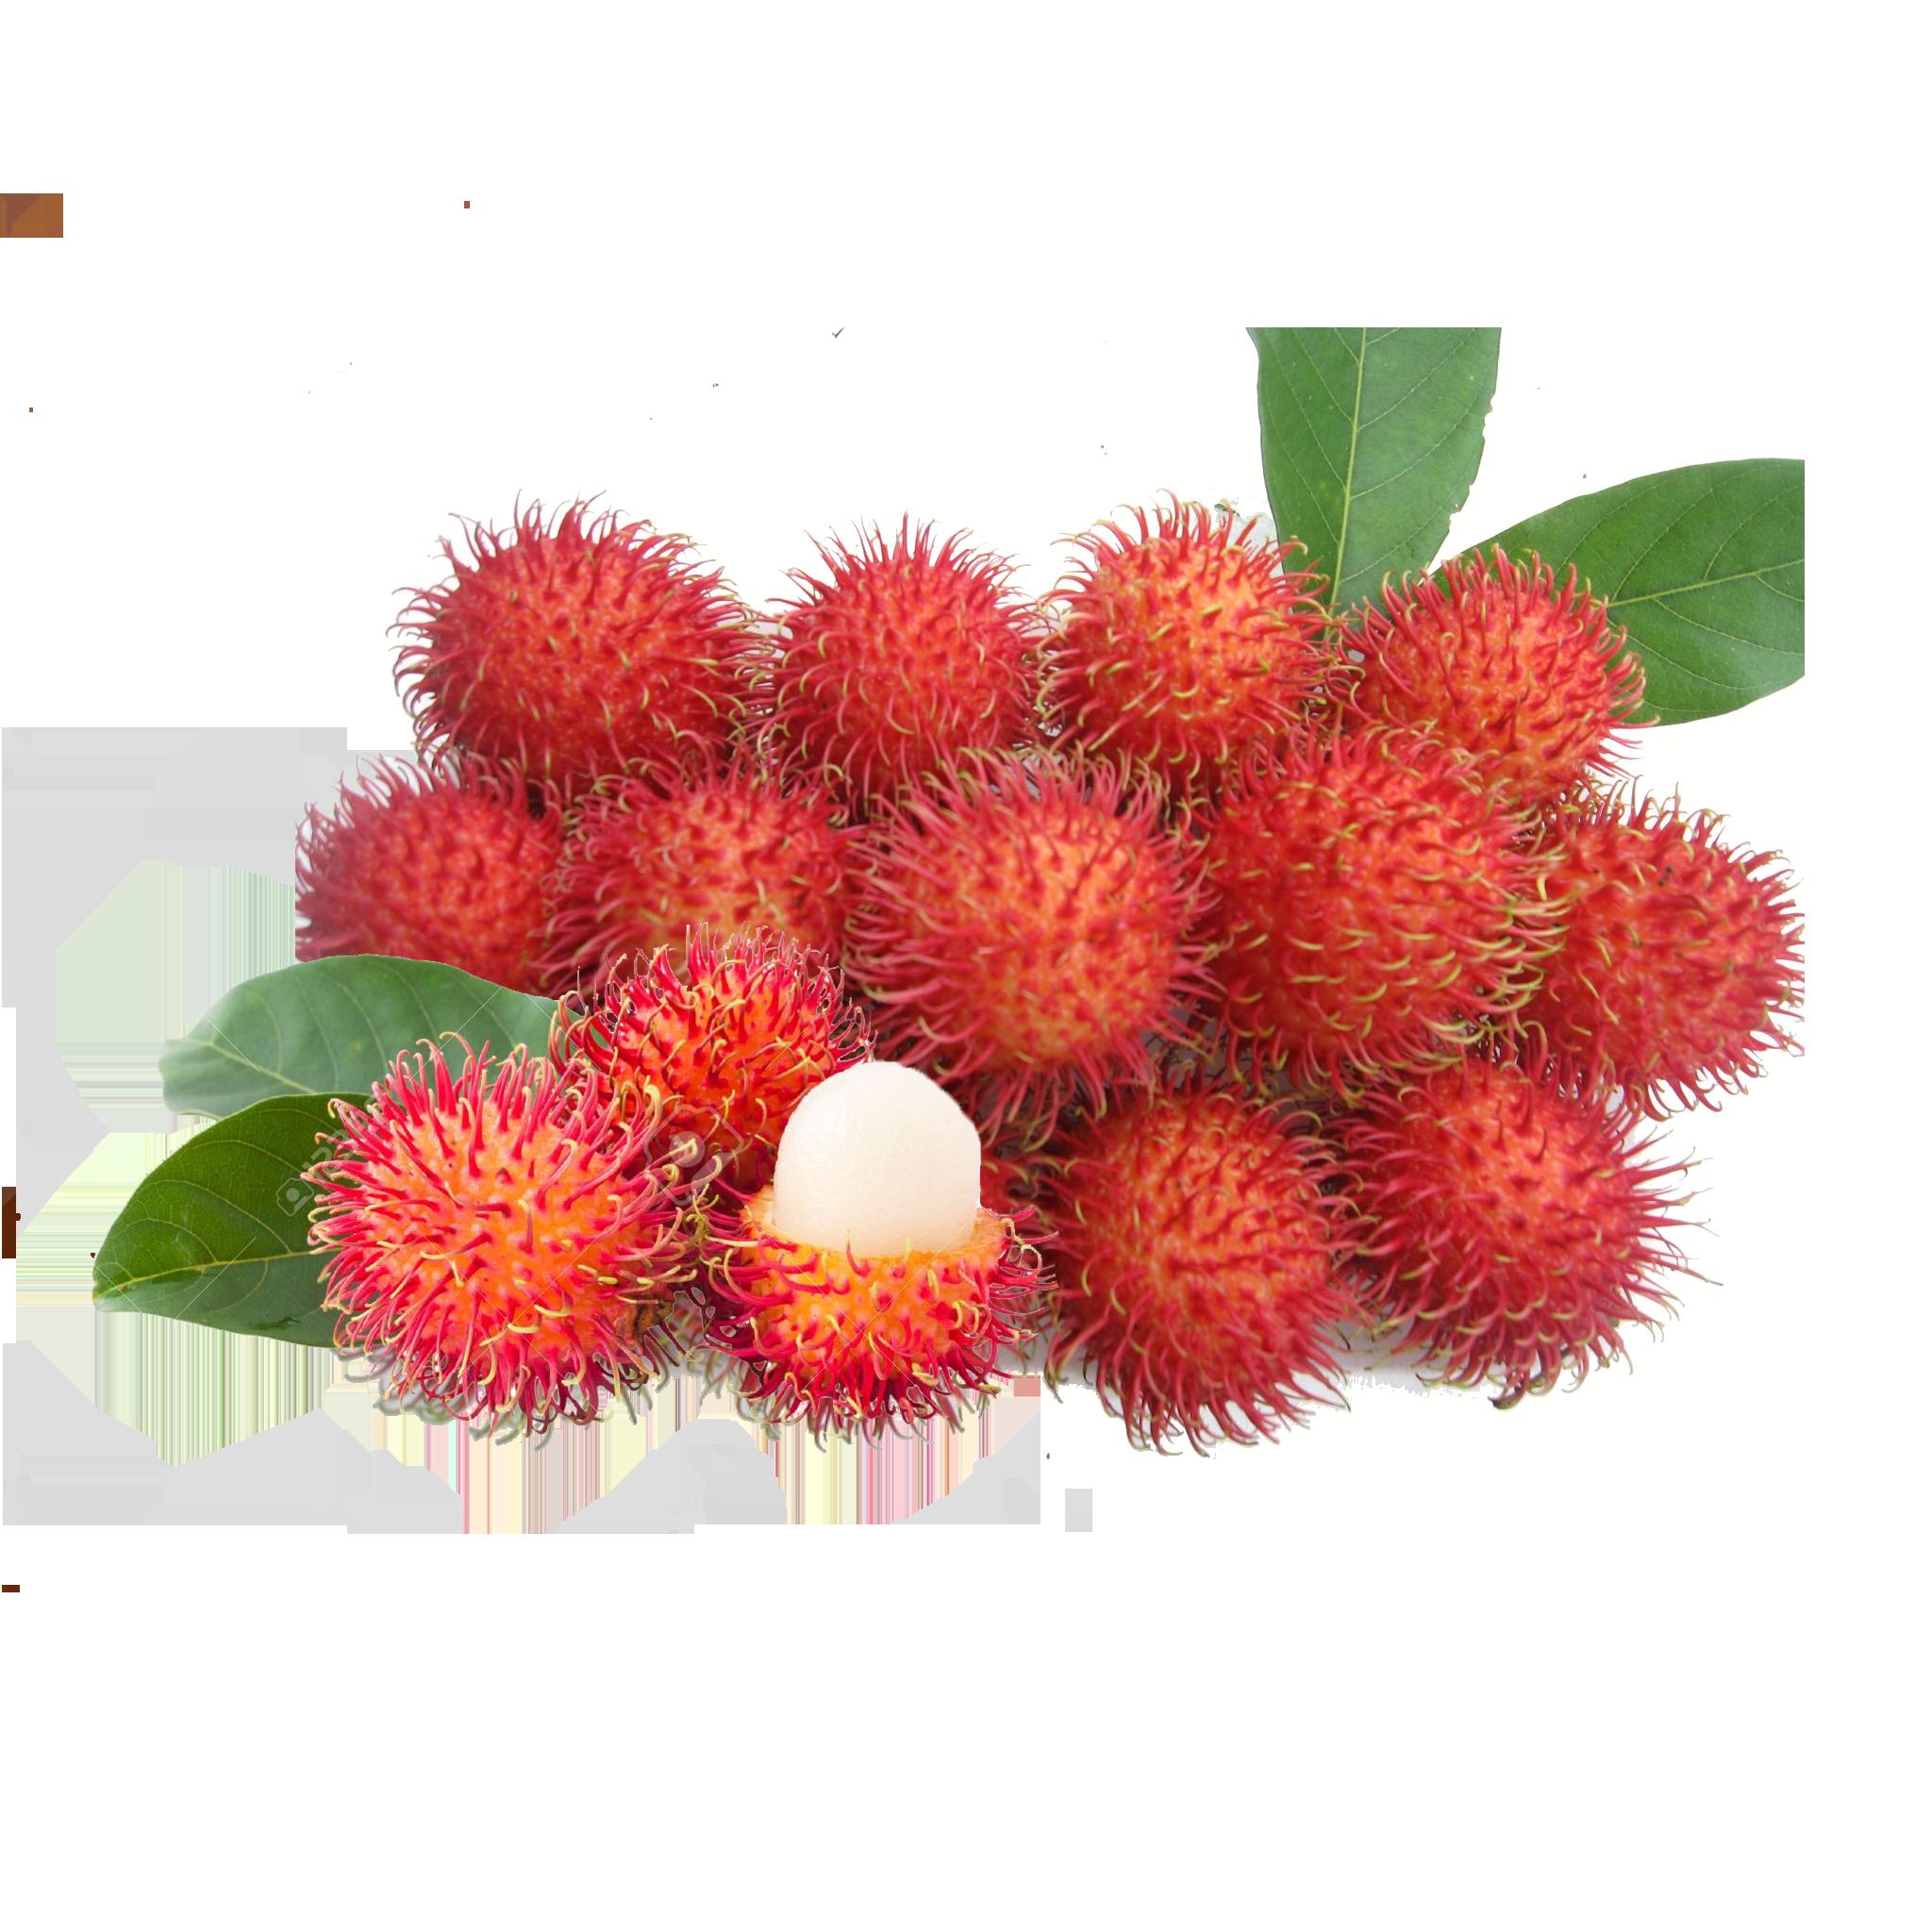 Rambutan Fruit - PNG Rambutan